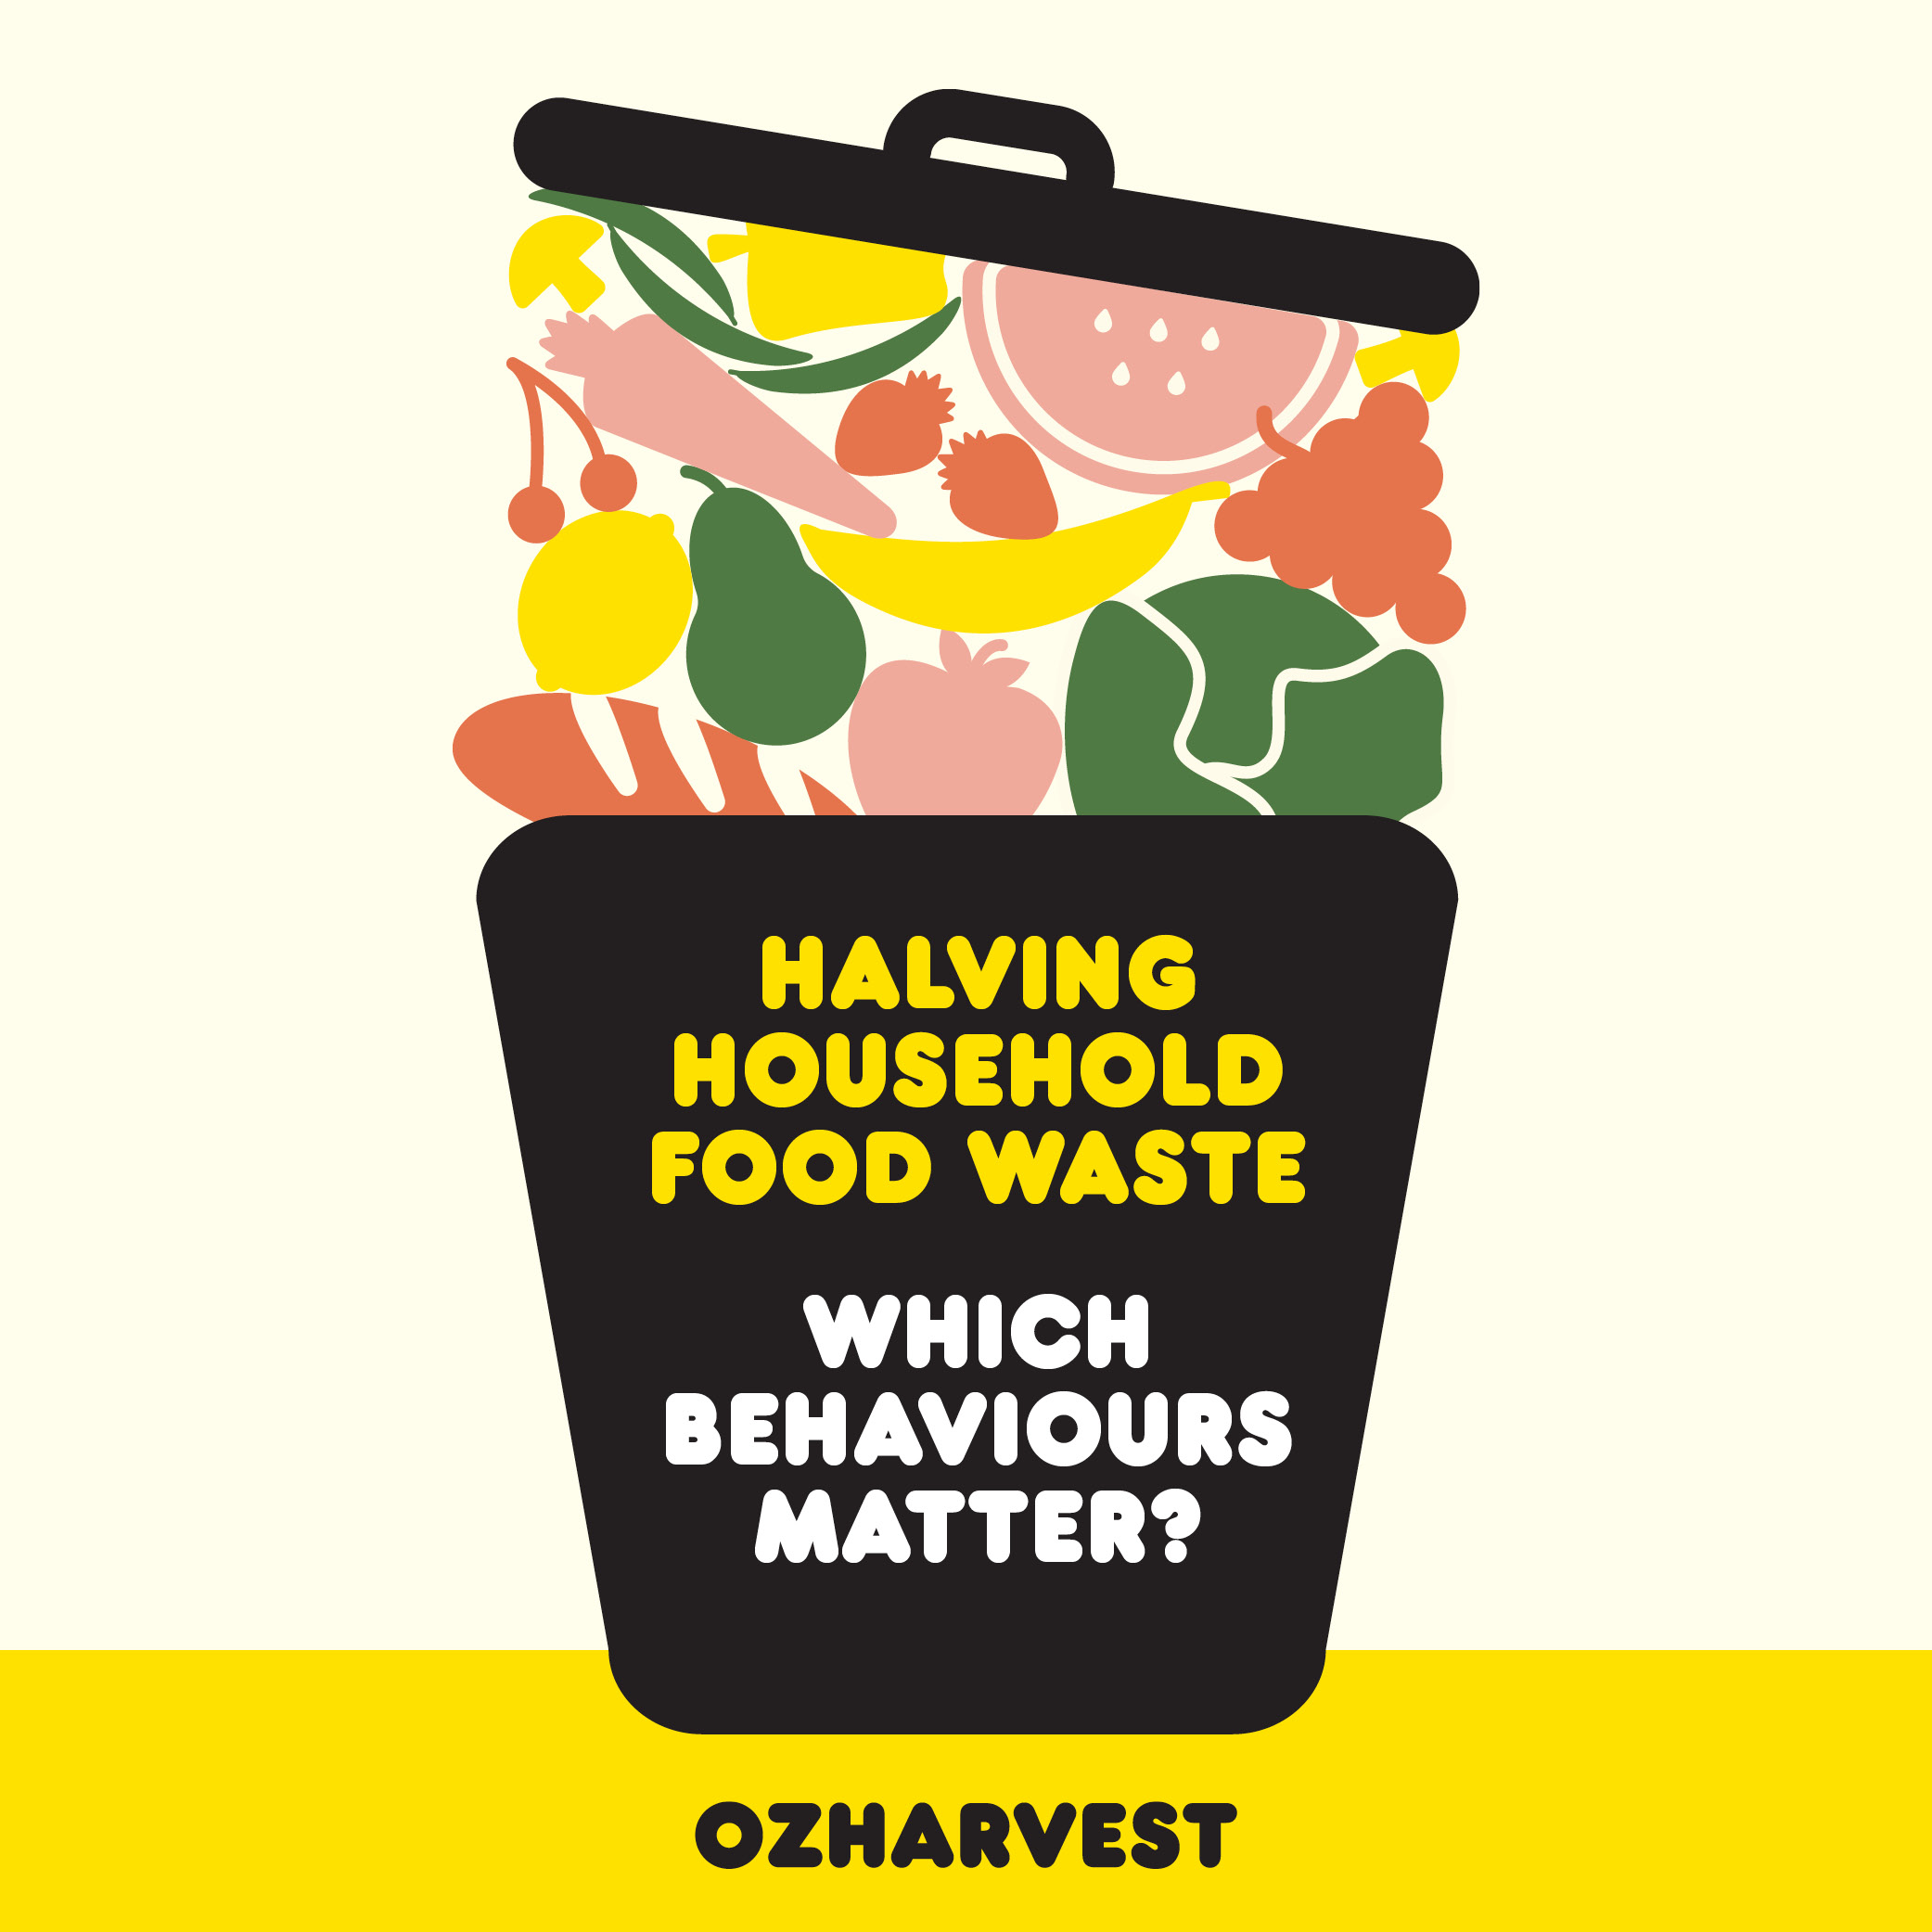 Halving Food Waste Image